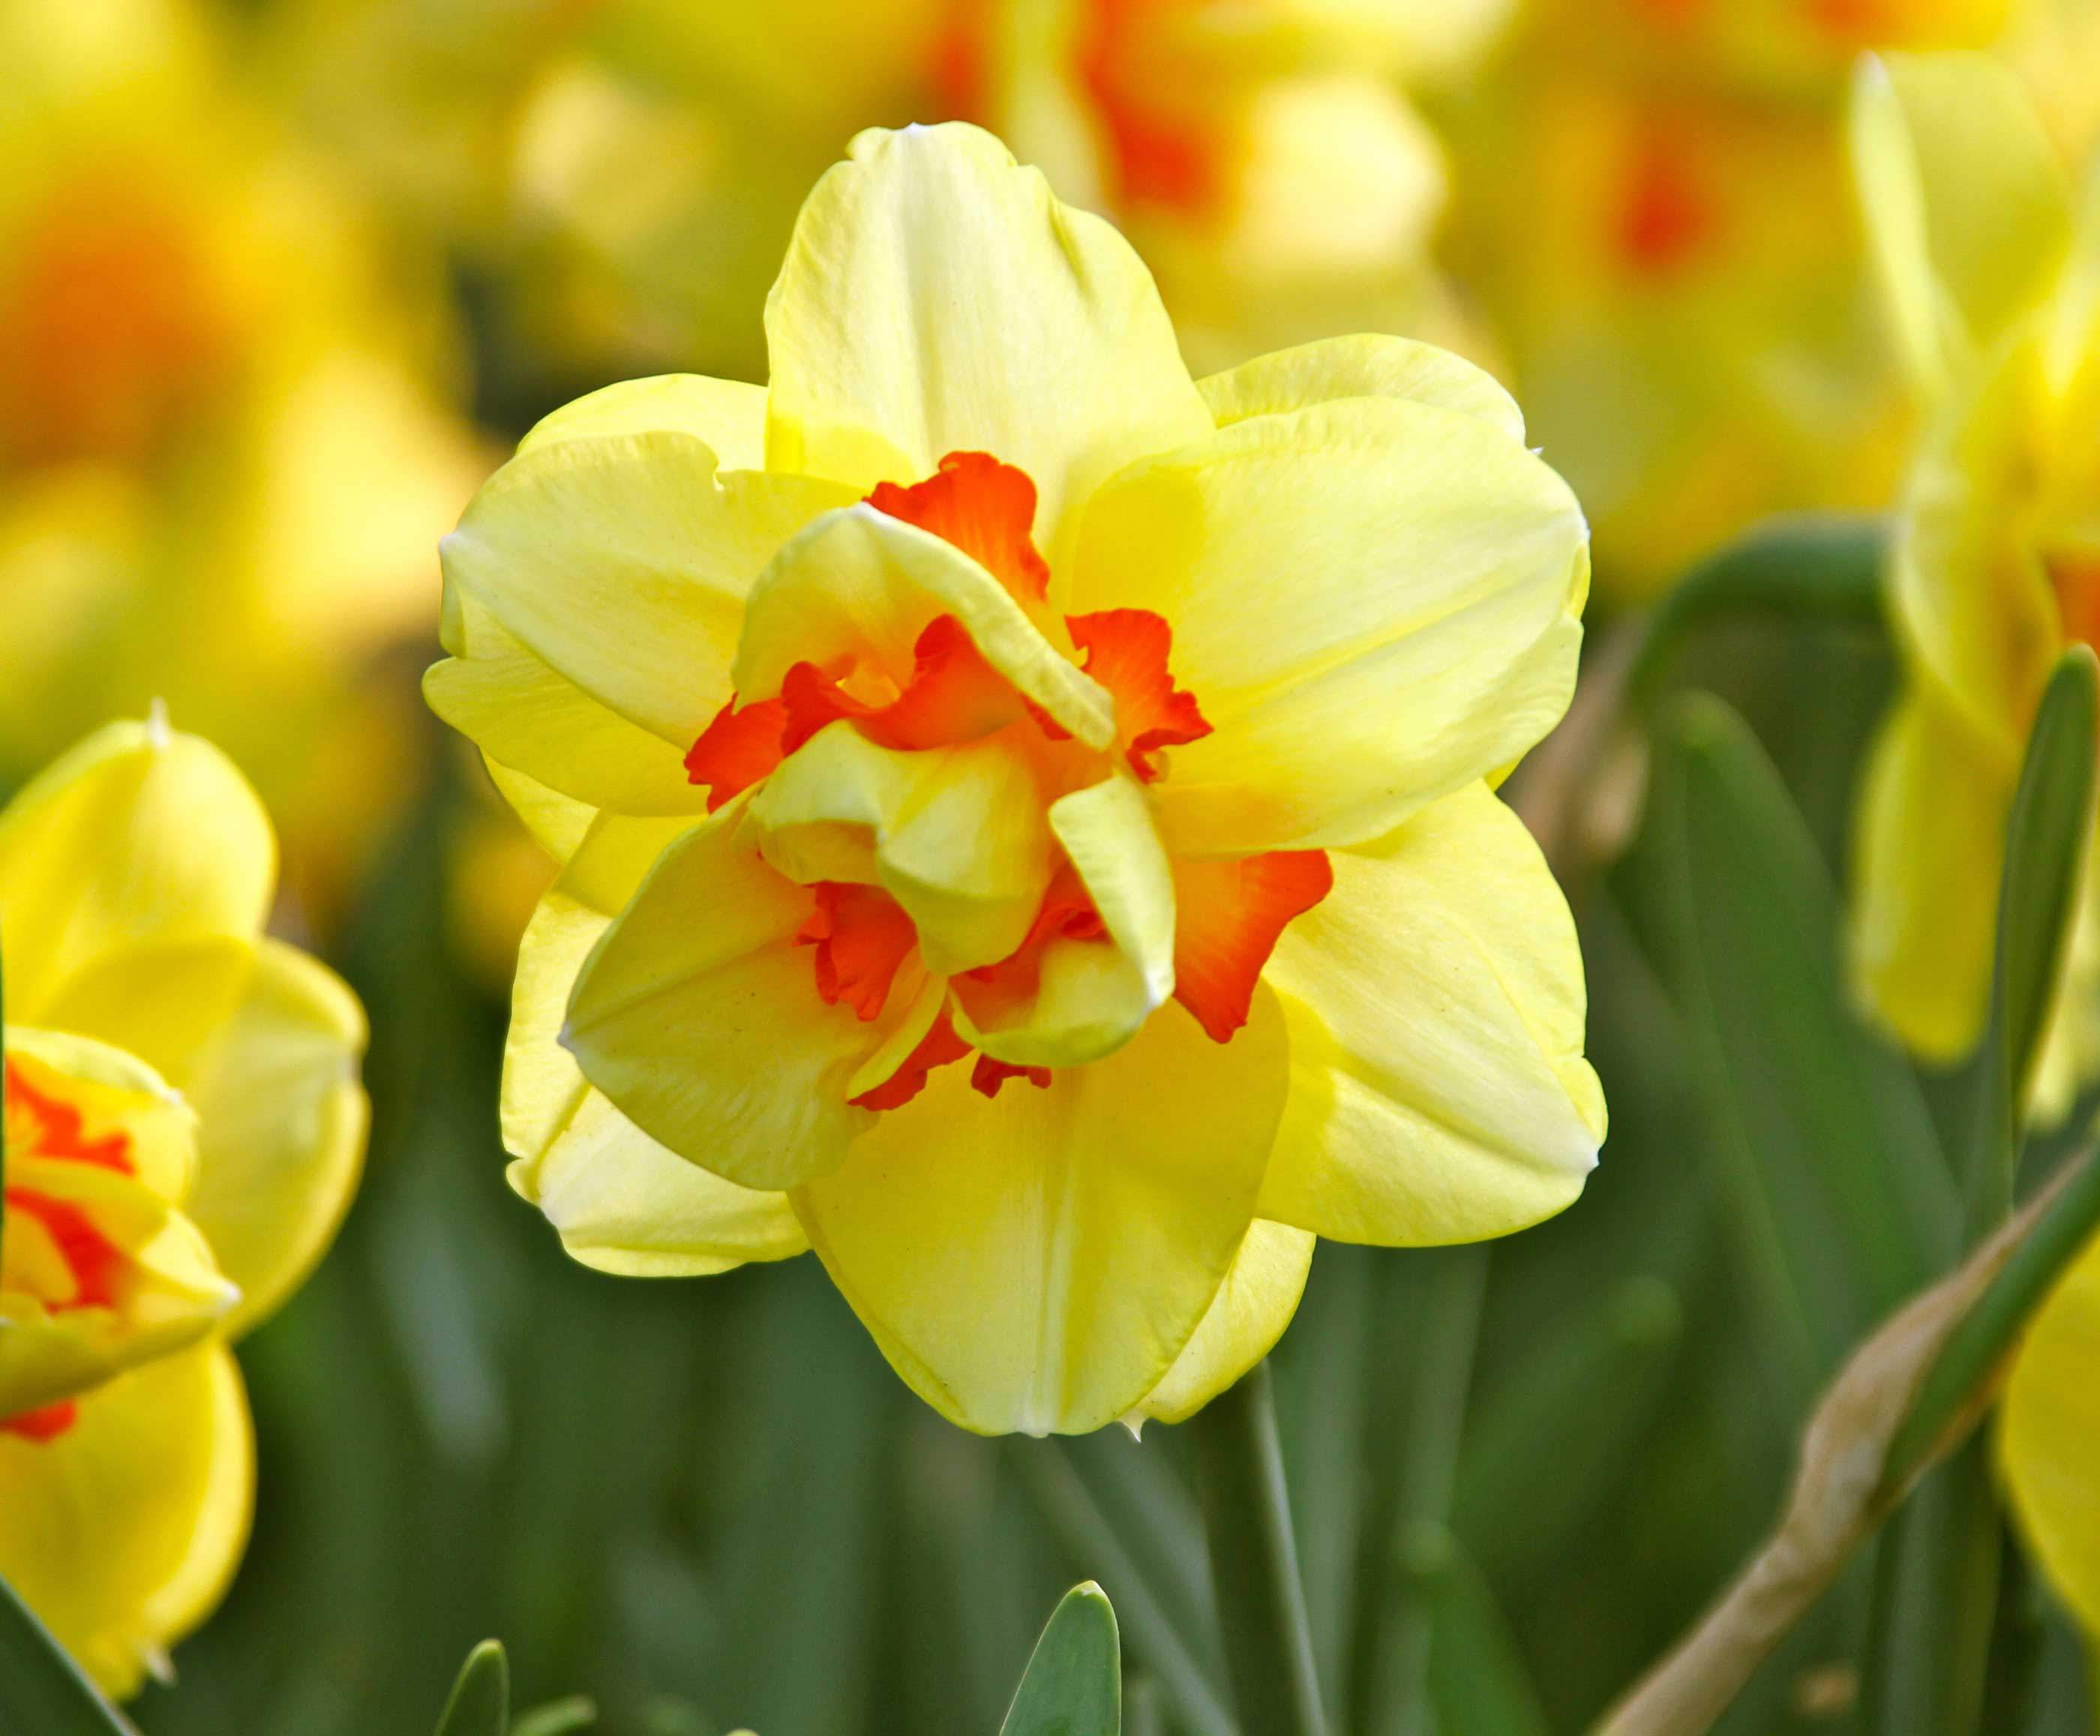 daffodil - photo #40